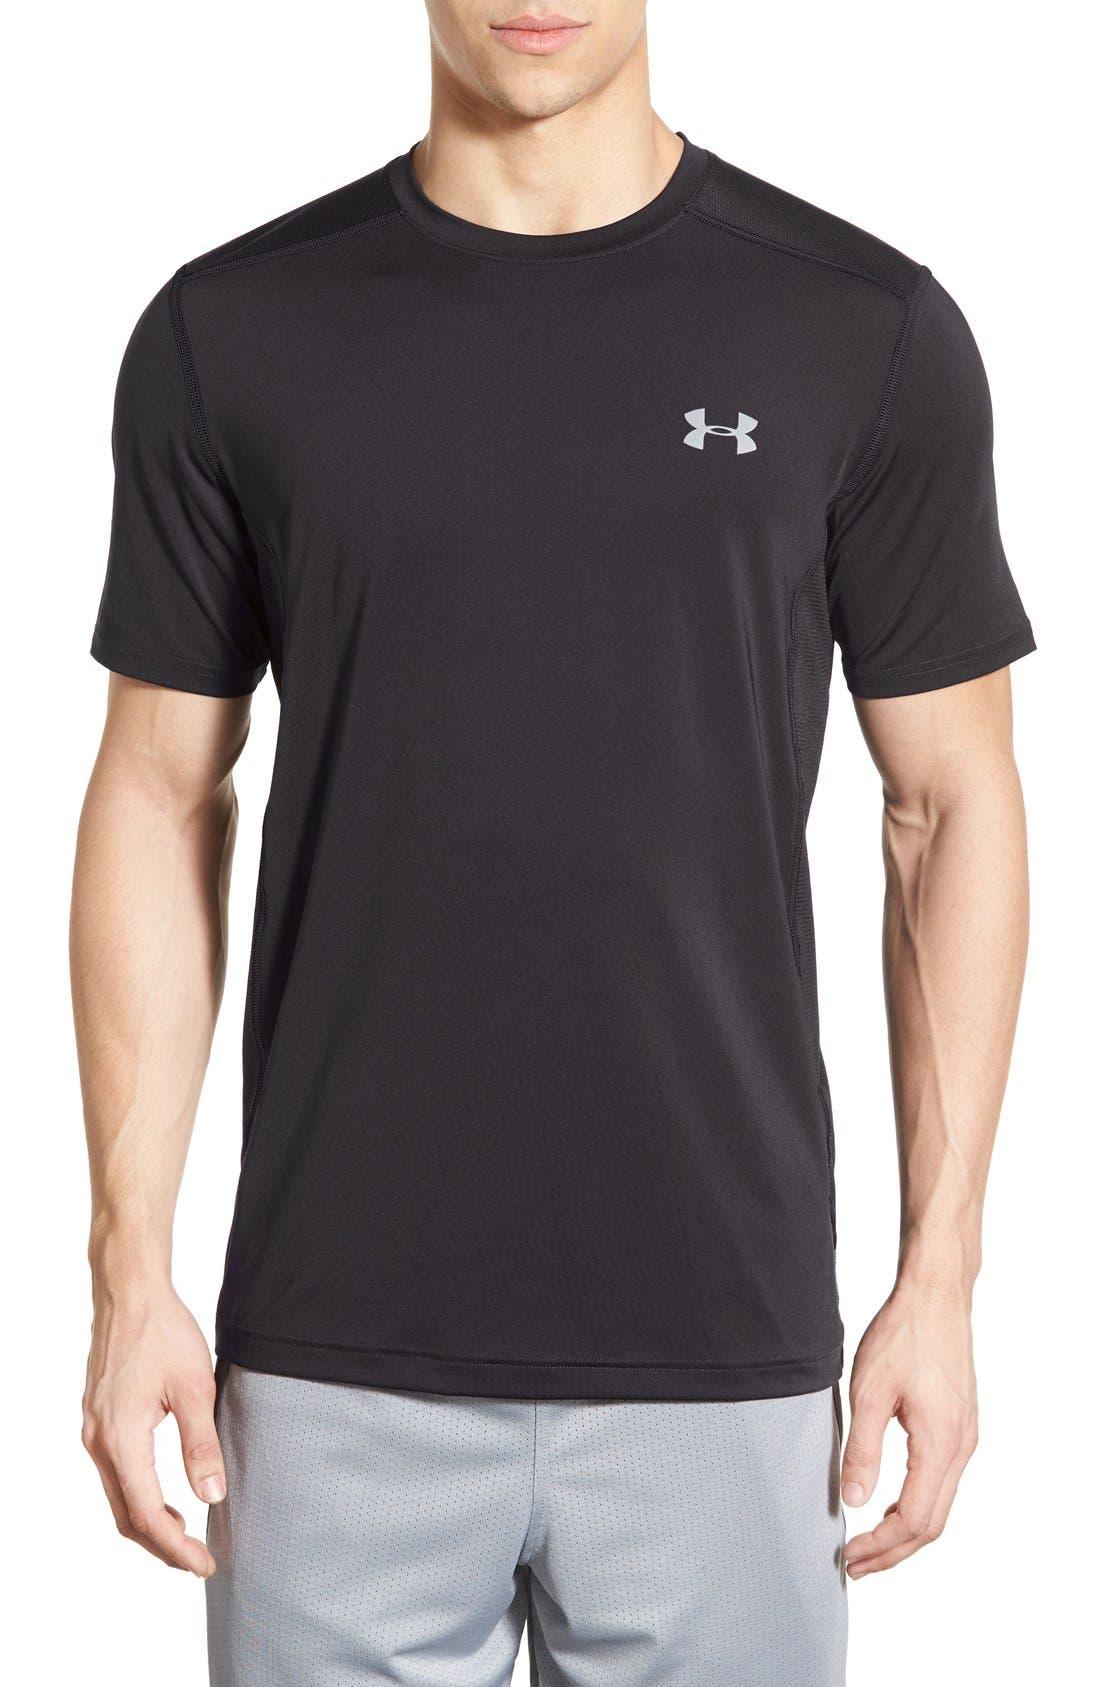 'Raid' HeatGear<sup>®</sup> Training T-Shirt,                         Main,                         color, Black/ Black/ Graphite